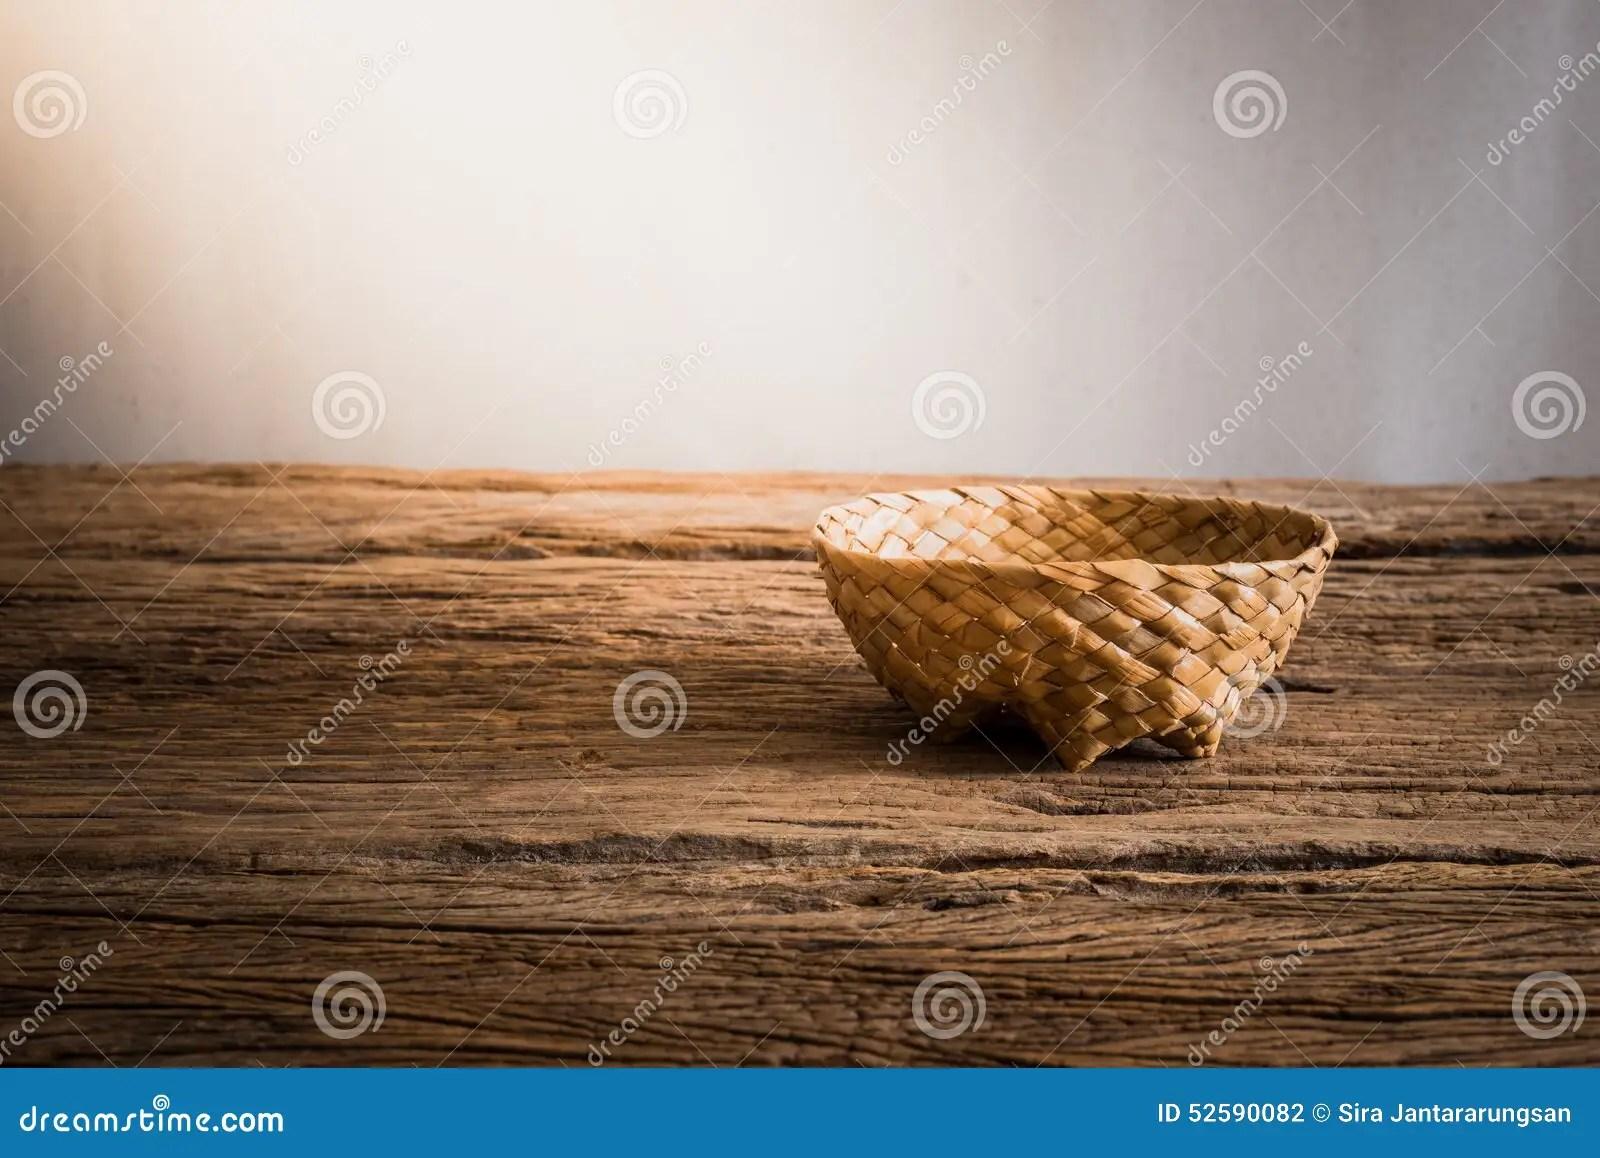 in stock kitchens 36 inch kitchen sink 在木桌面的空的柳条筐 库存照片. 图片 包括有 弯脚的, 墙壁, 牌照, 餐馆, 藤条, 仍然, 庆祝, 厨房 ...